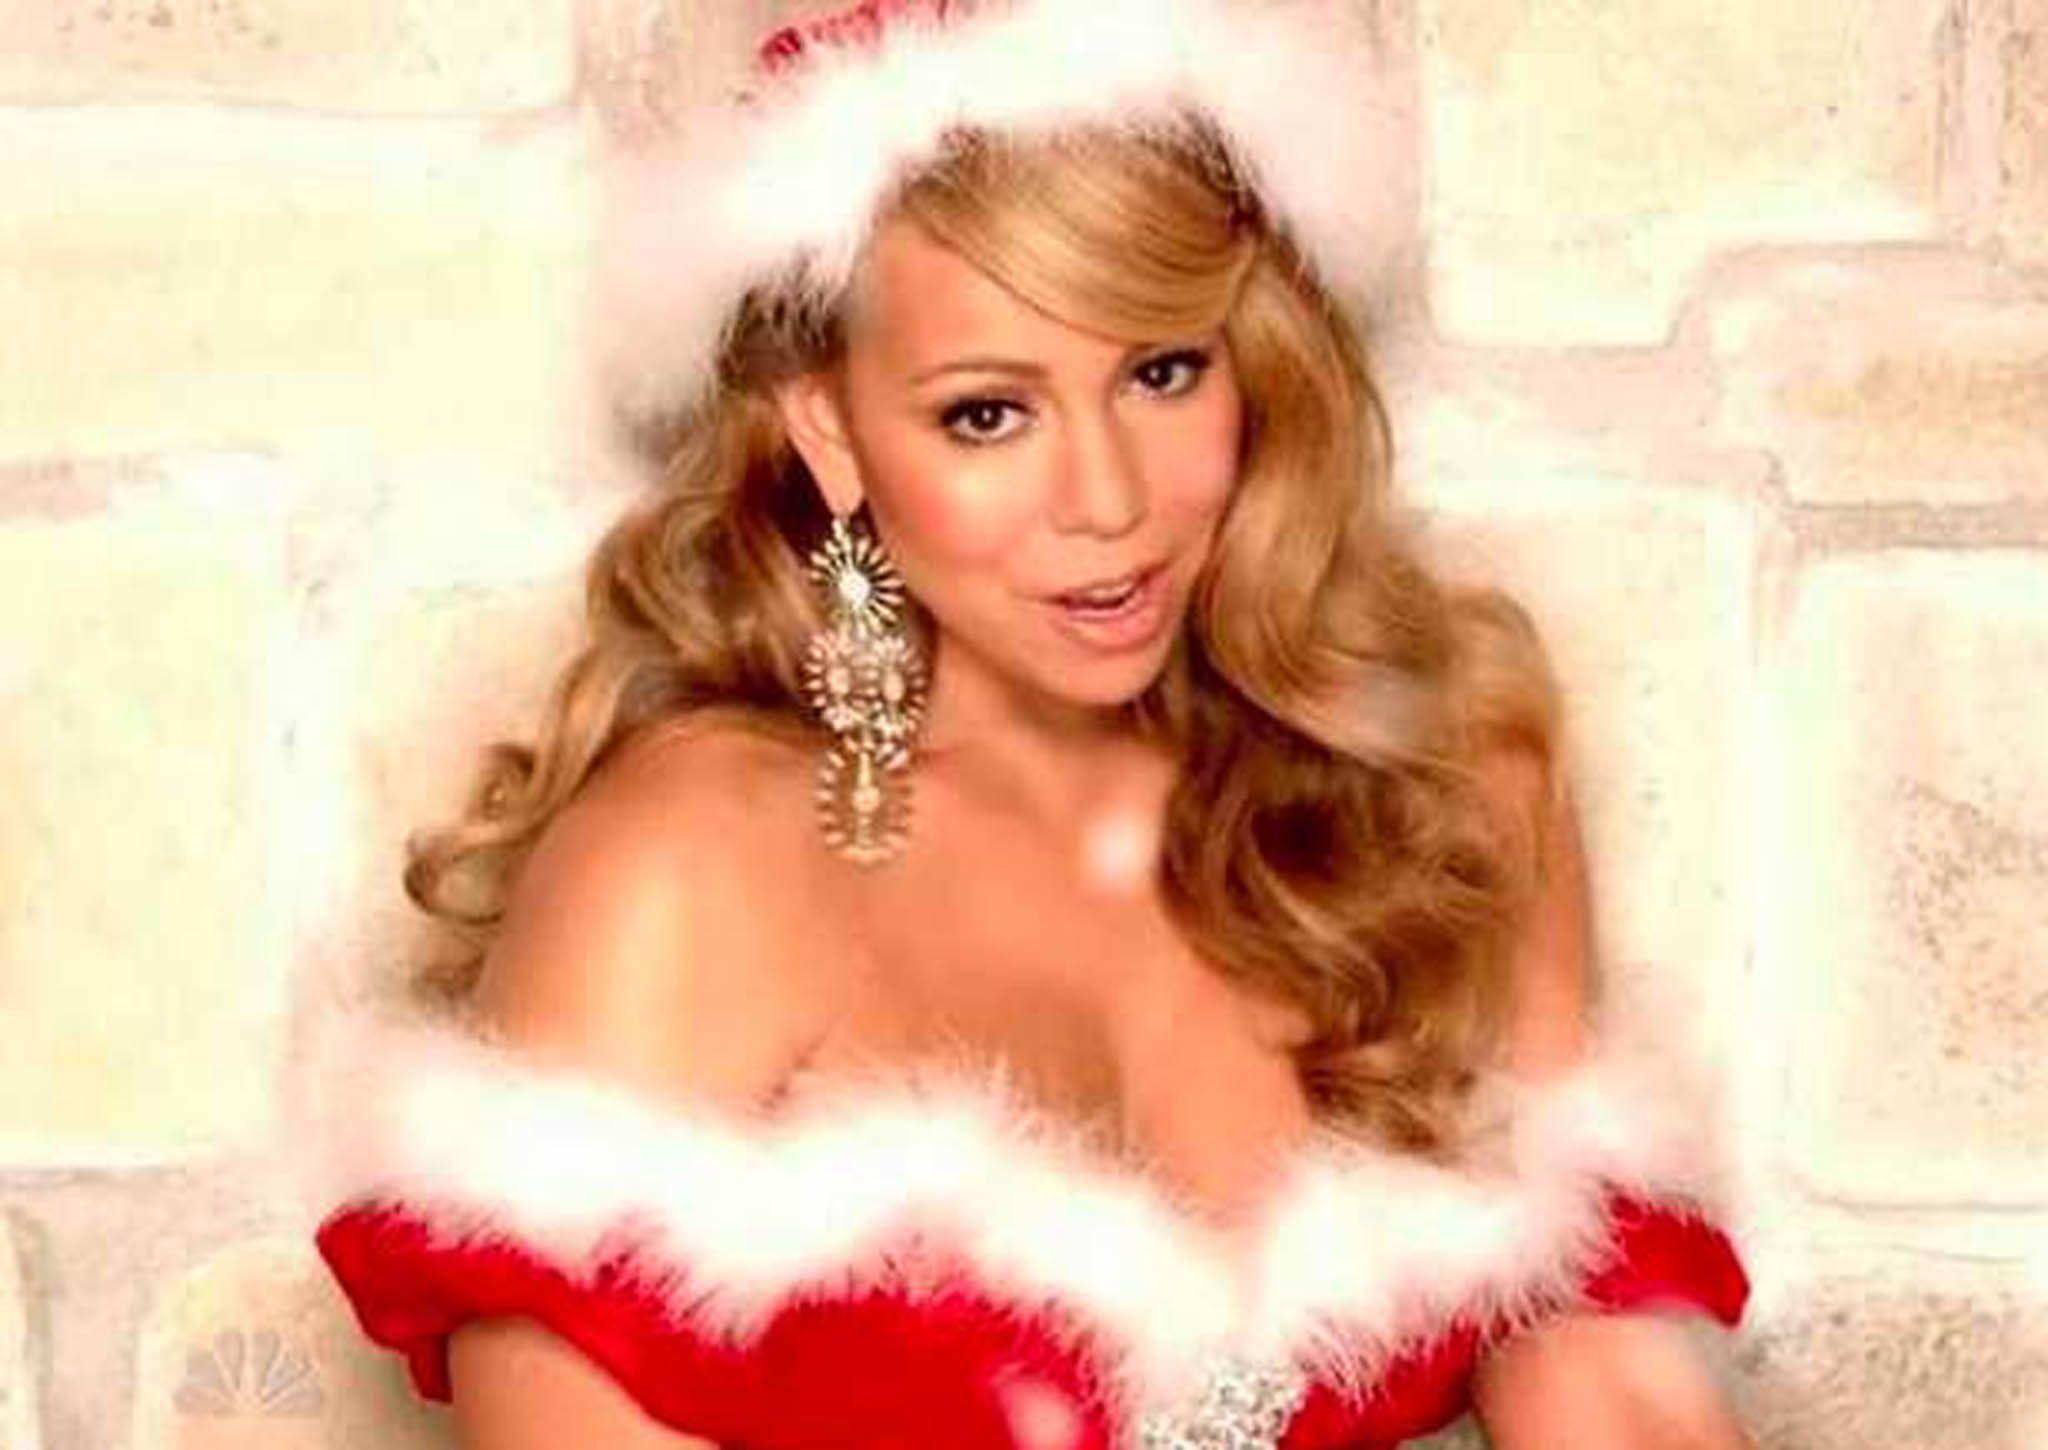 Mariah Carey's 'All I Want for Christmas is You' breaks a million sales | Mariah carey, Mariah ...